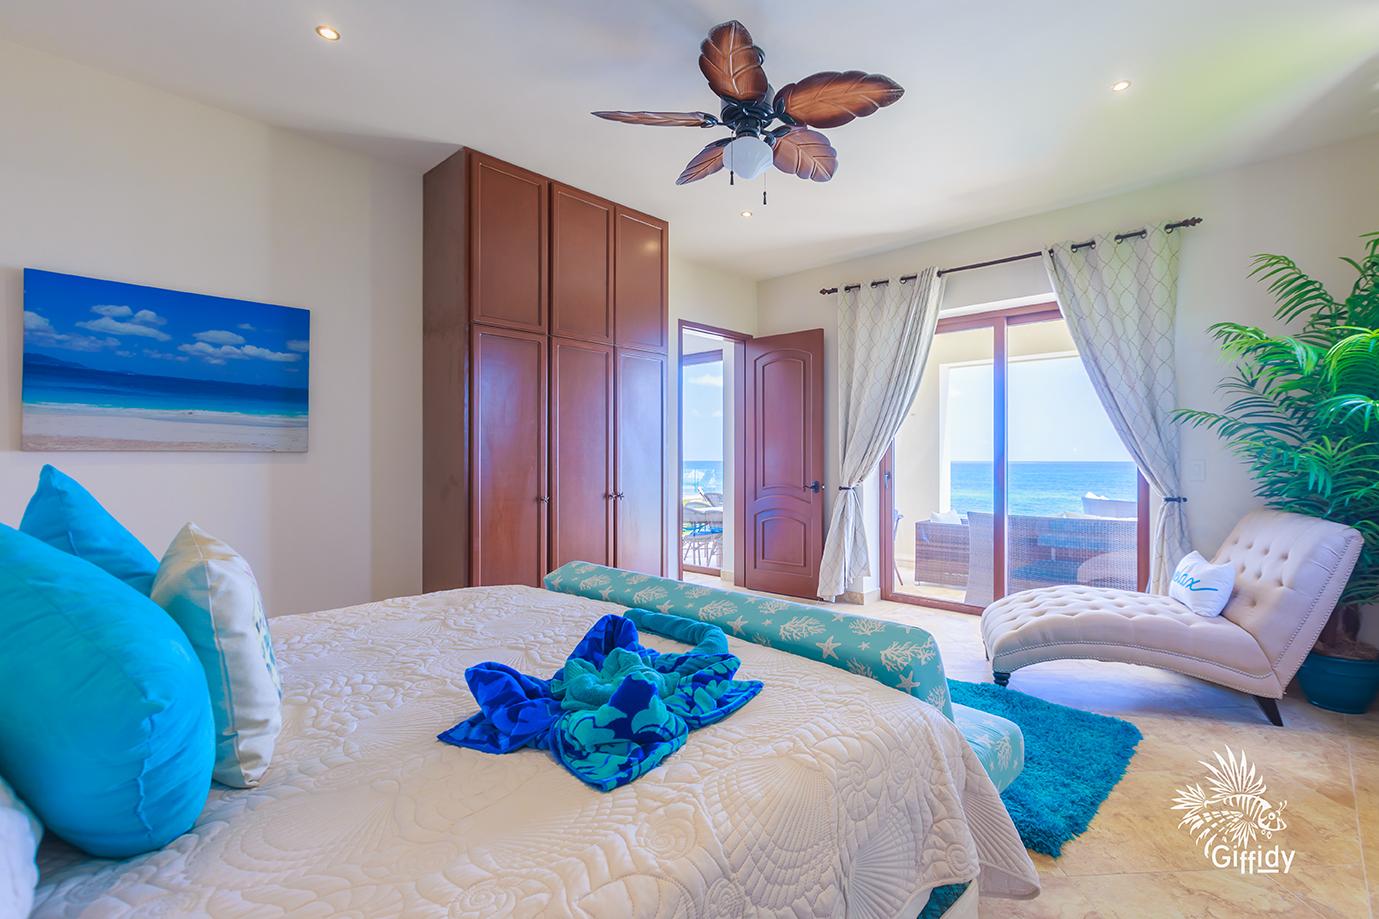 Tortuga Bedroom